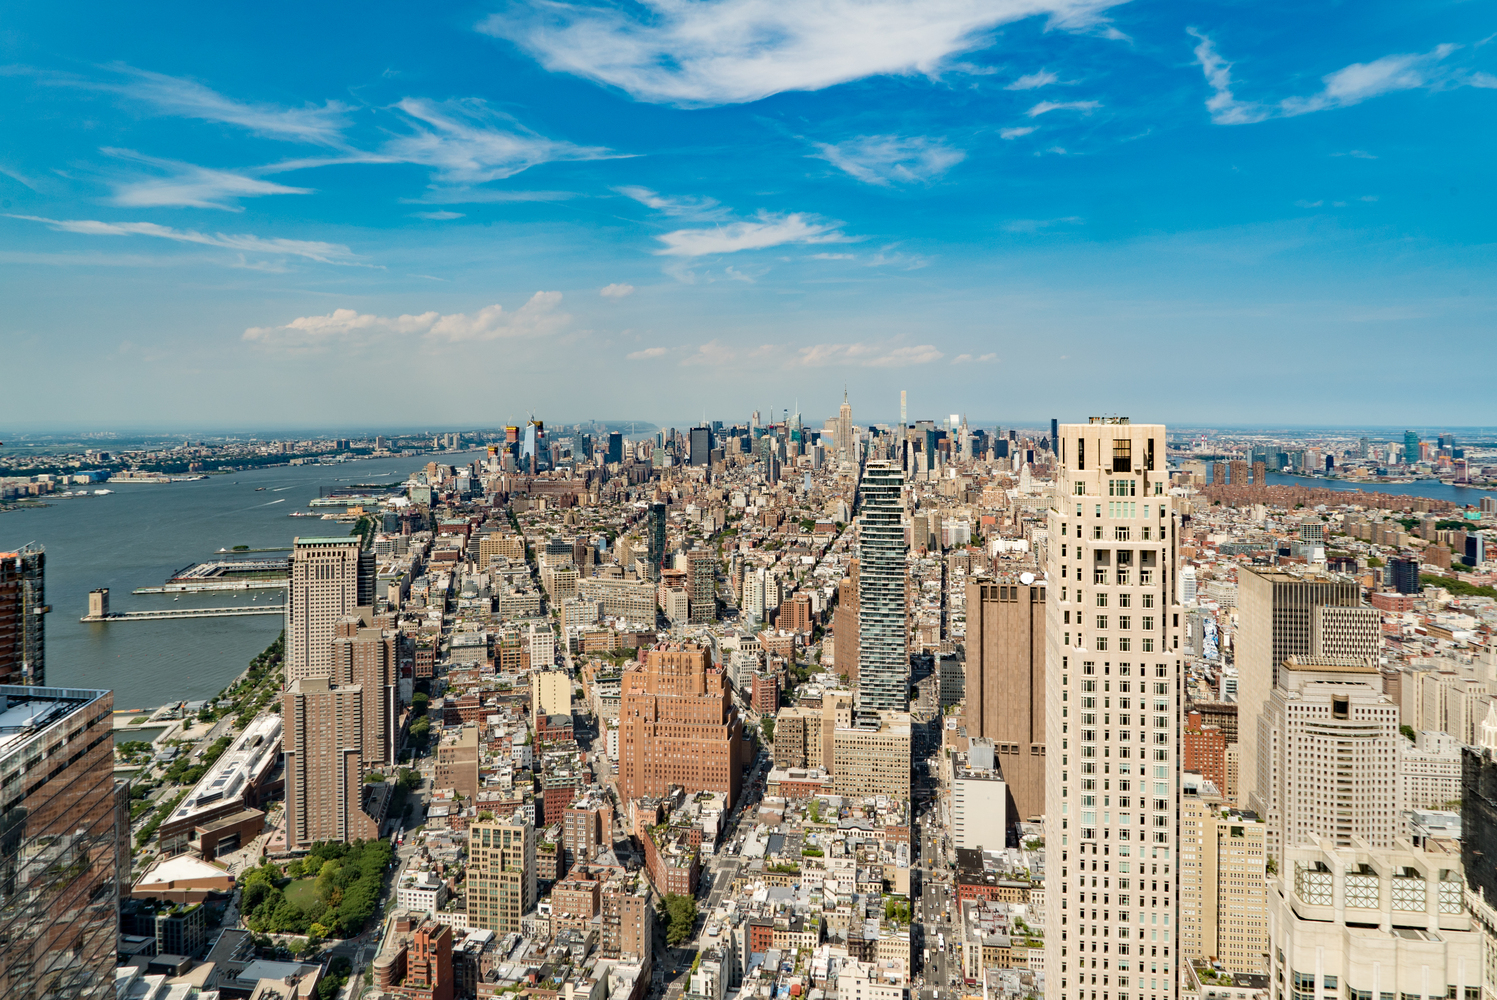 Rogers Stirk Harbour + Partners' 3 World Trade Center - New York - IGS Magazine - 9